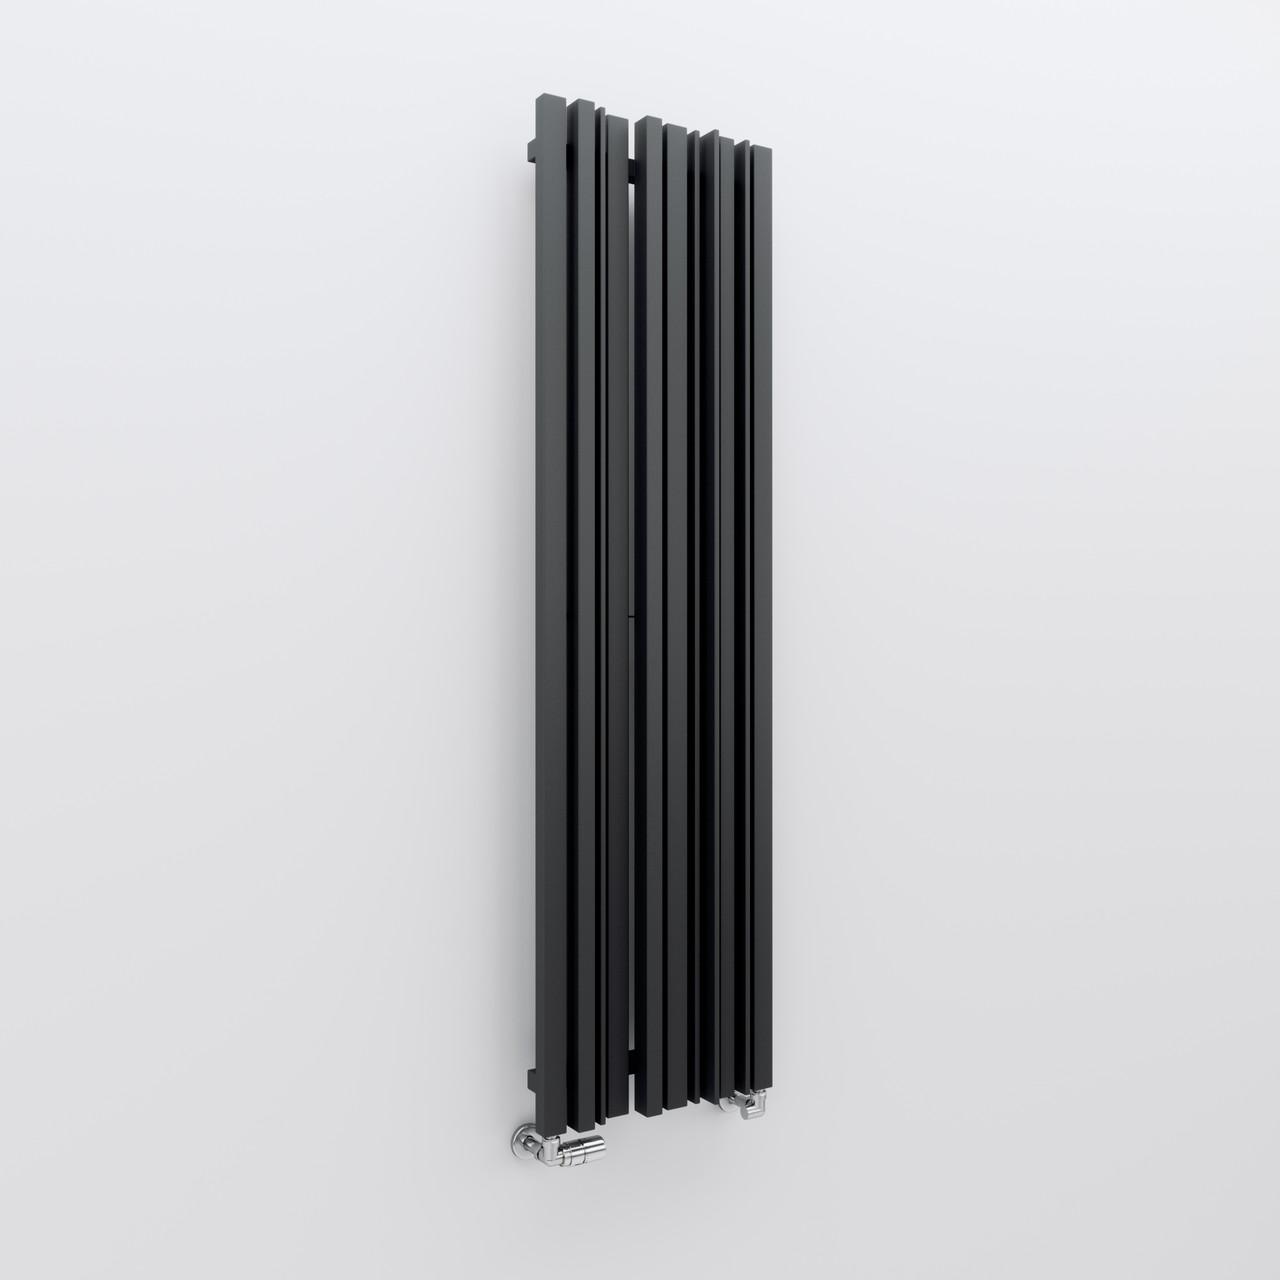 TERMA Дизайн радіатор SHERWOOD V 1900*540 Metallic black